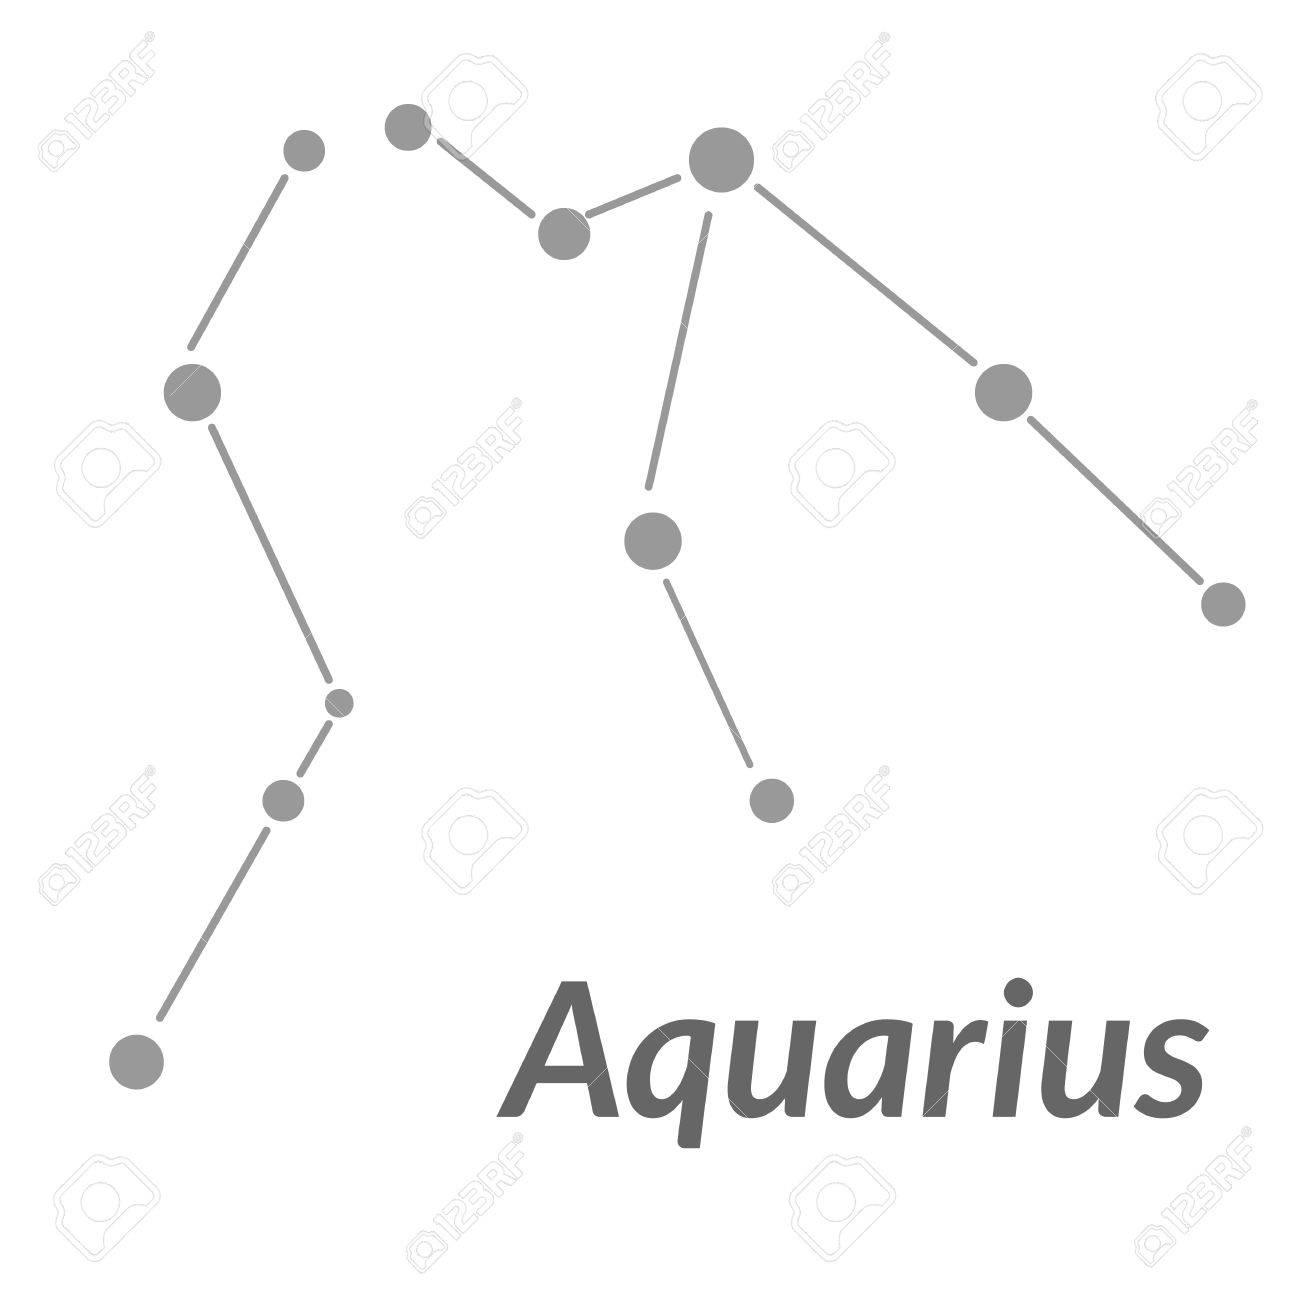 The Water Bearer Aquarius Sing Star Constellation Element Age